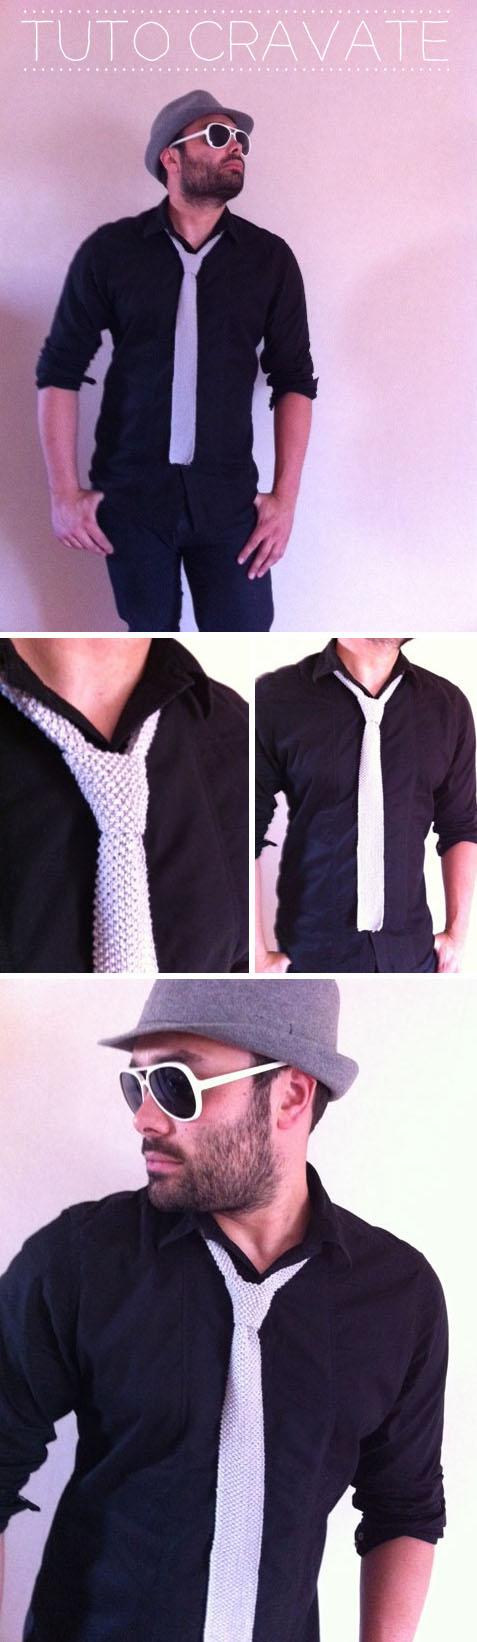 tricot cravate homme tuto tricot pinterest. Black Bedroom Furniture Sets. Home Design Ideas